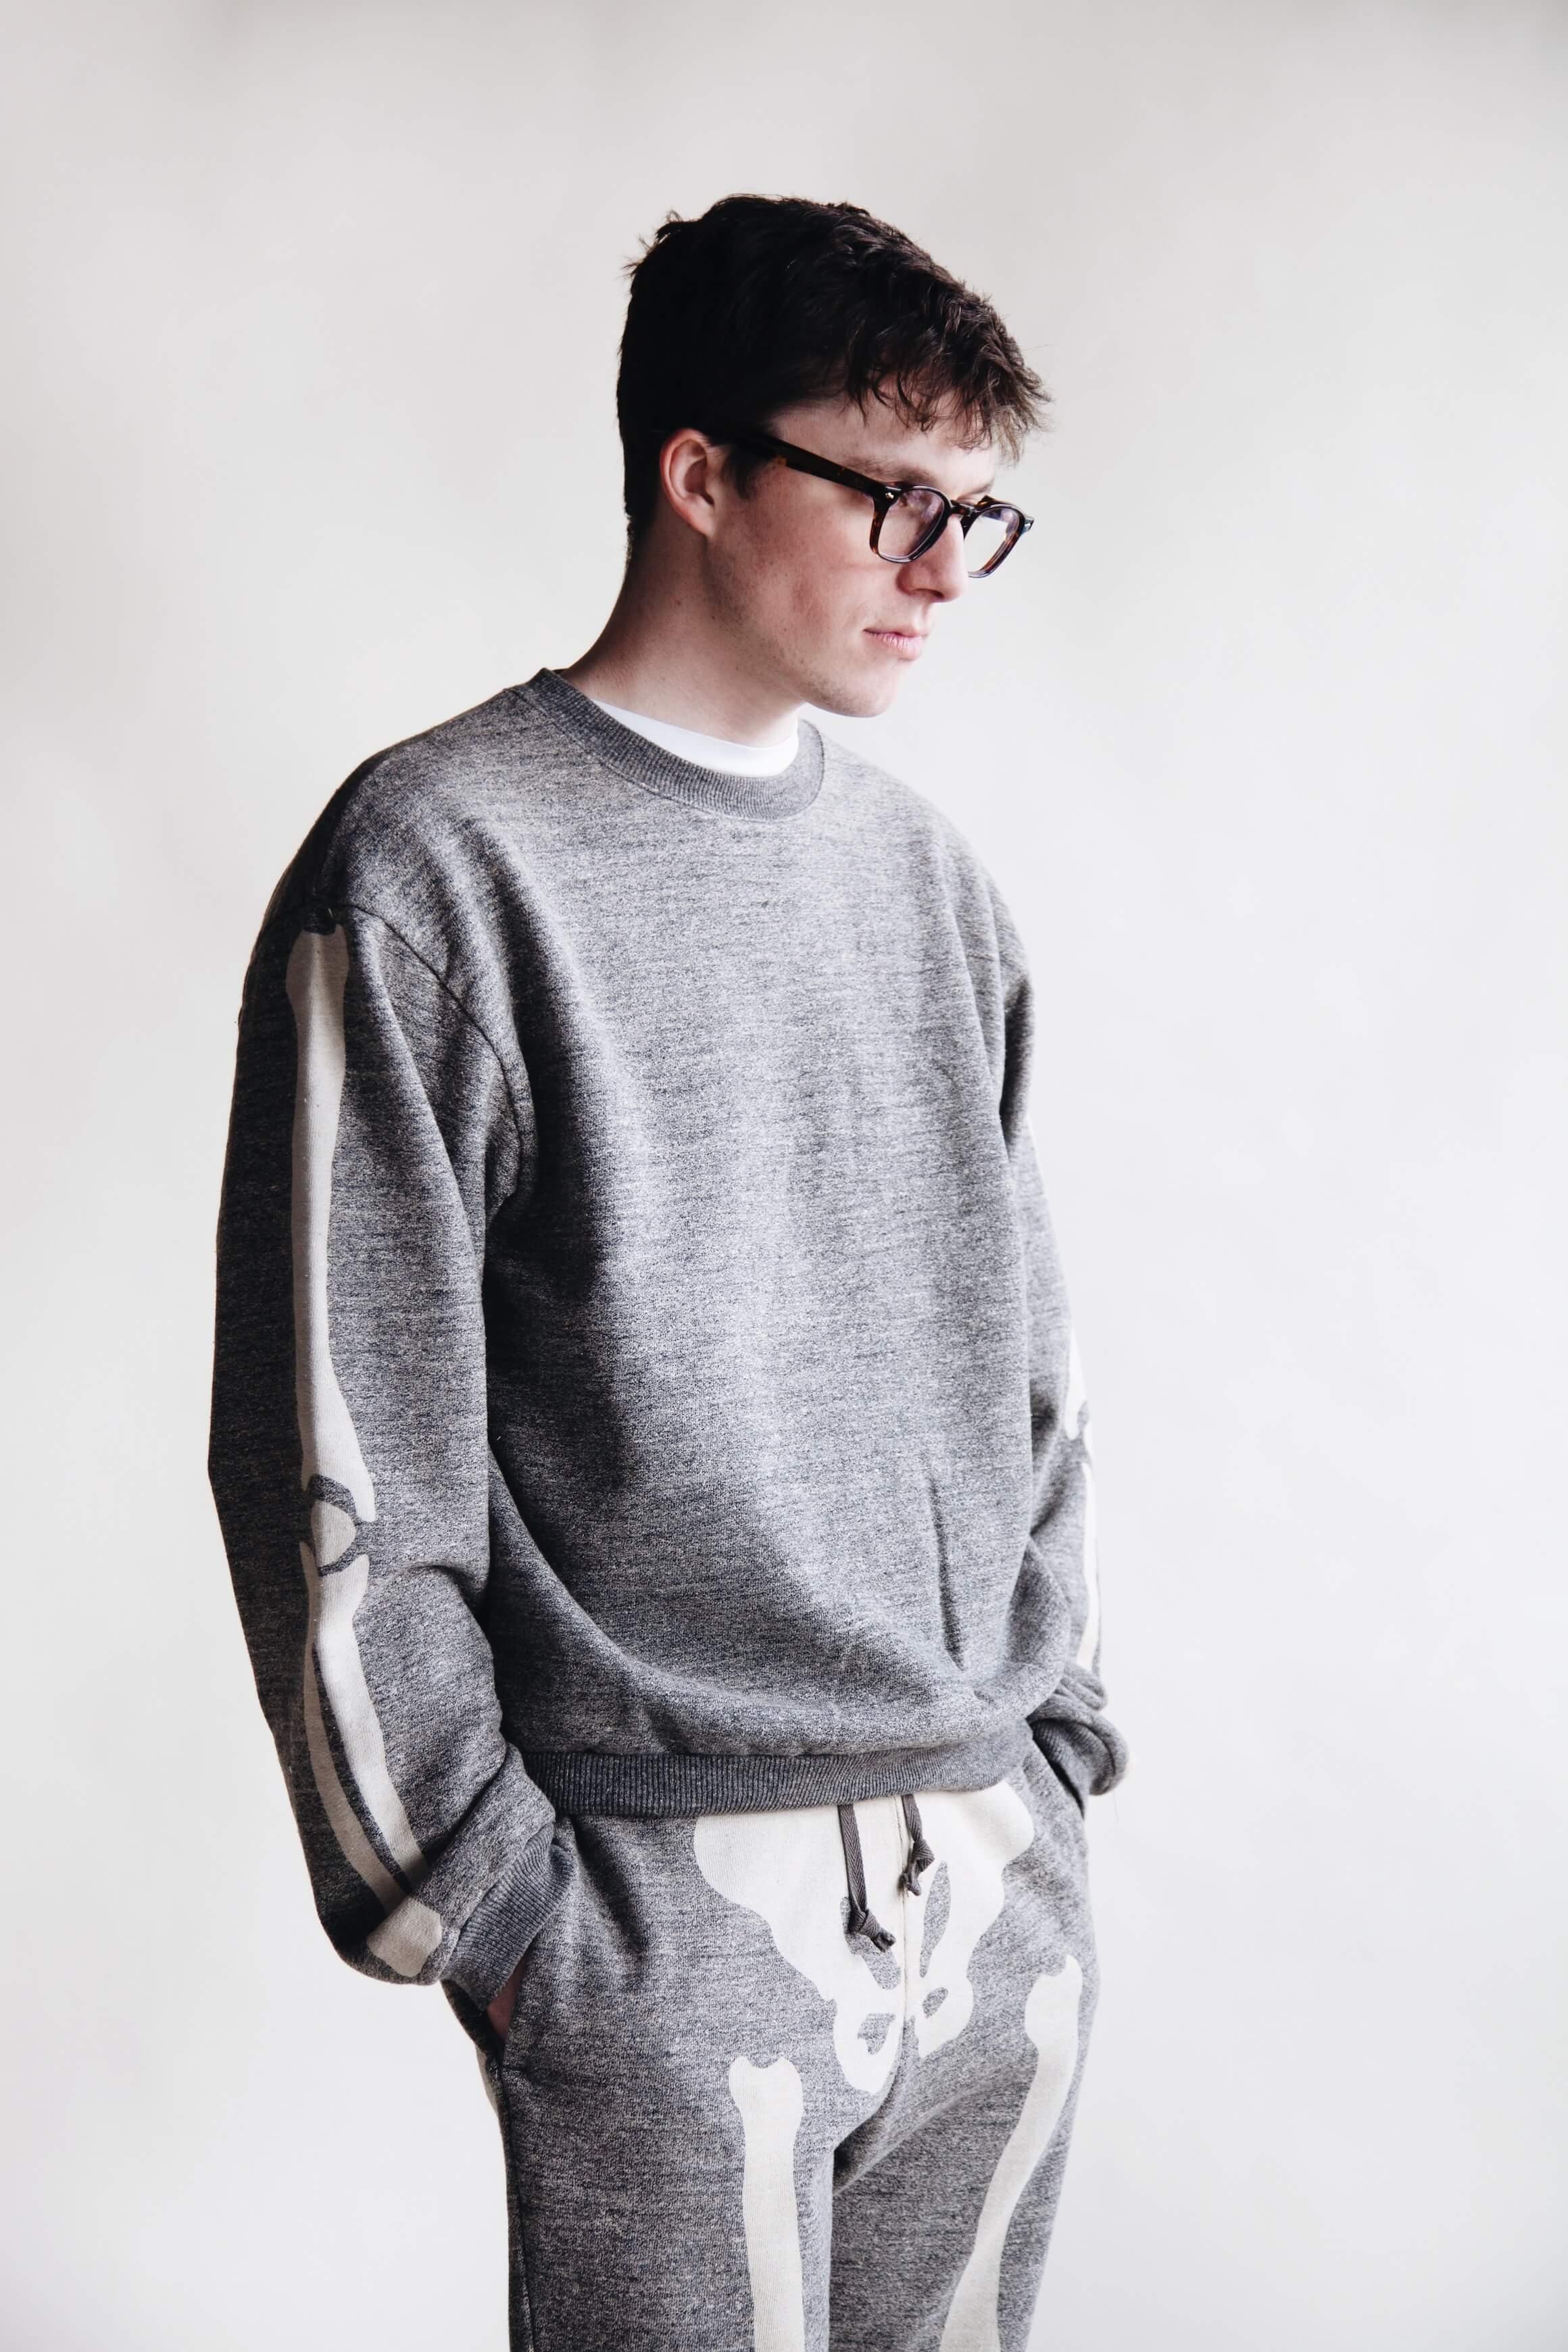 kapital clothing japan gandrelle fleece knit big crew sweat (bone), gandrelle fleece knit sweat pants (bone), and hender scheme MIP 18 shoes on body